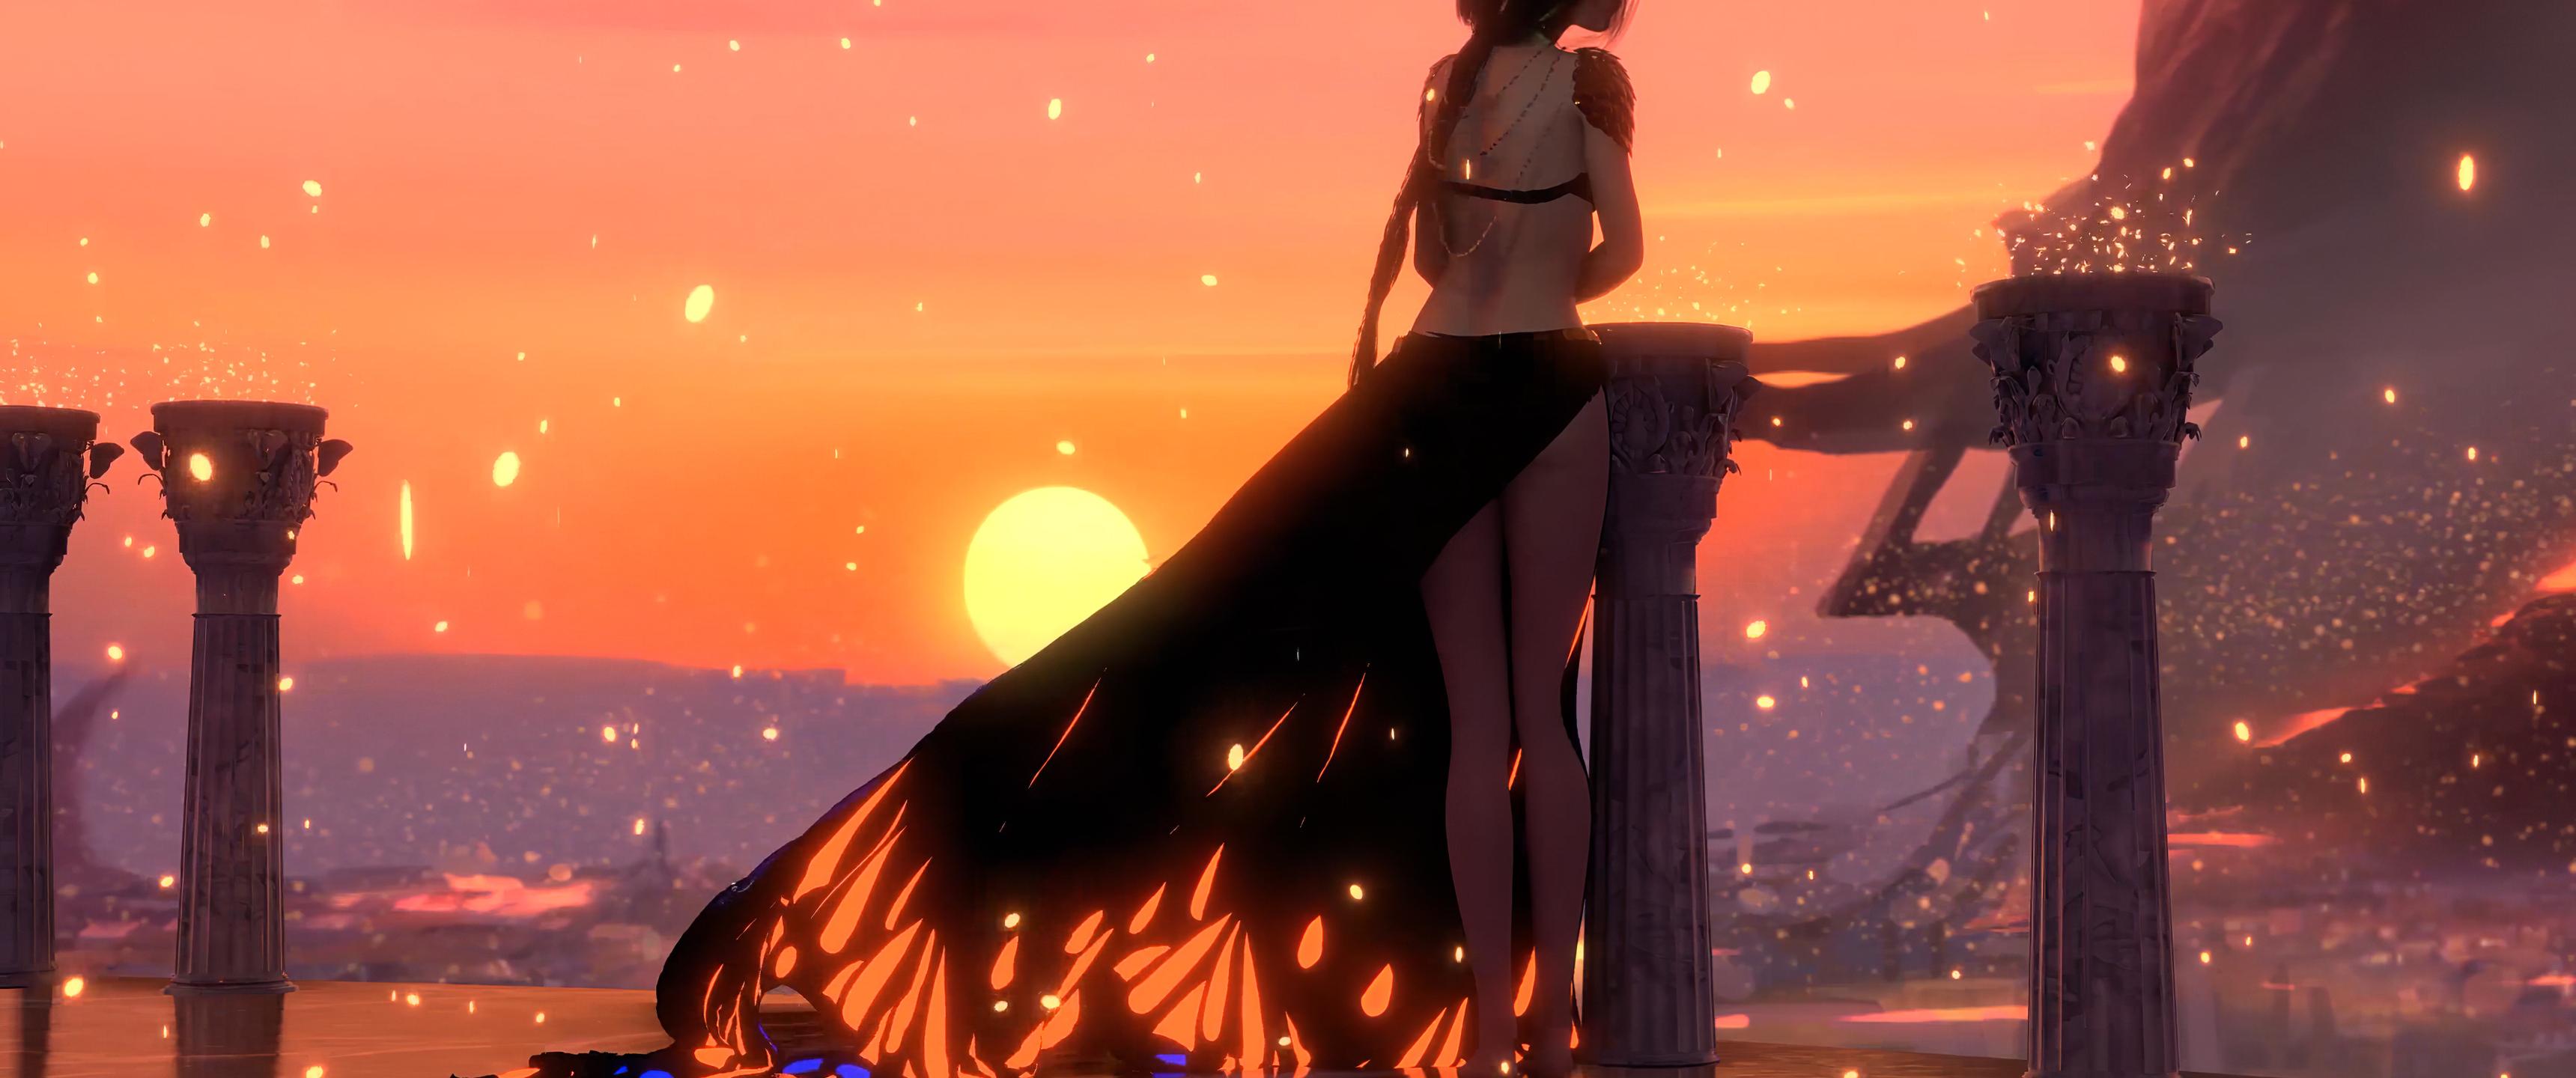 3440x1440 Wlop Anime Girl Sunset 4k 3440x1440 Resolution Hd 4k